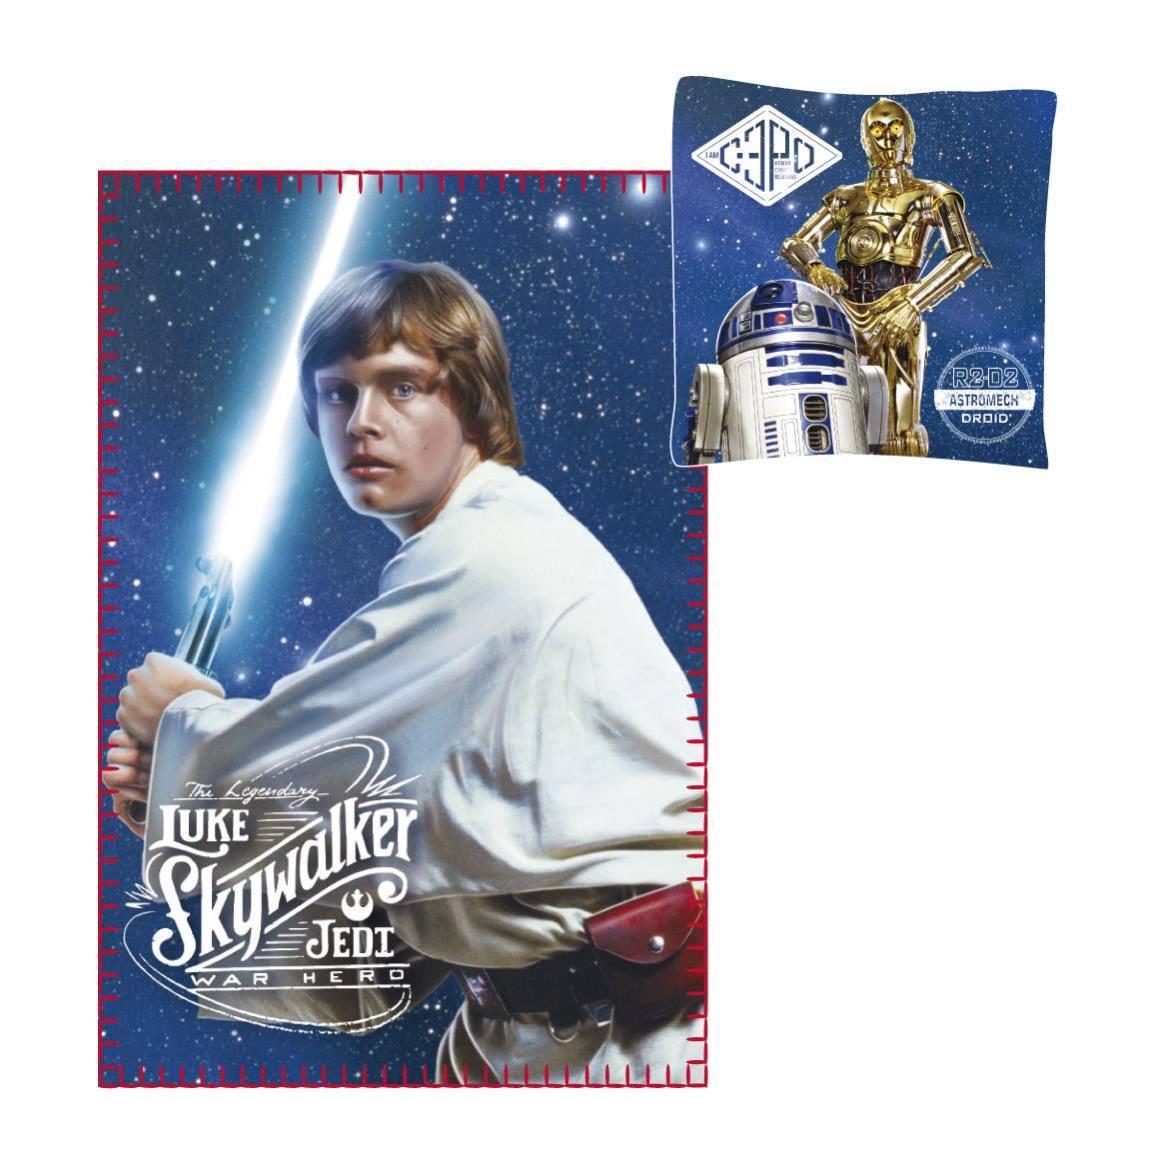 Star Wars Pillow & Fleece Blanket Set Luke Skywalker & C-3PO & R2-D2